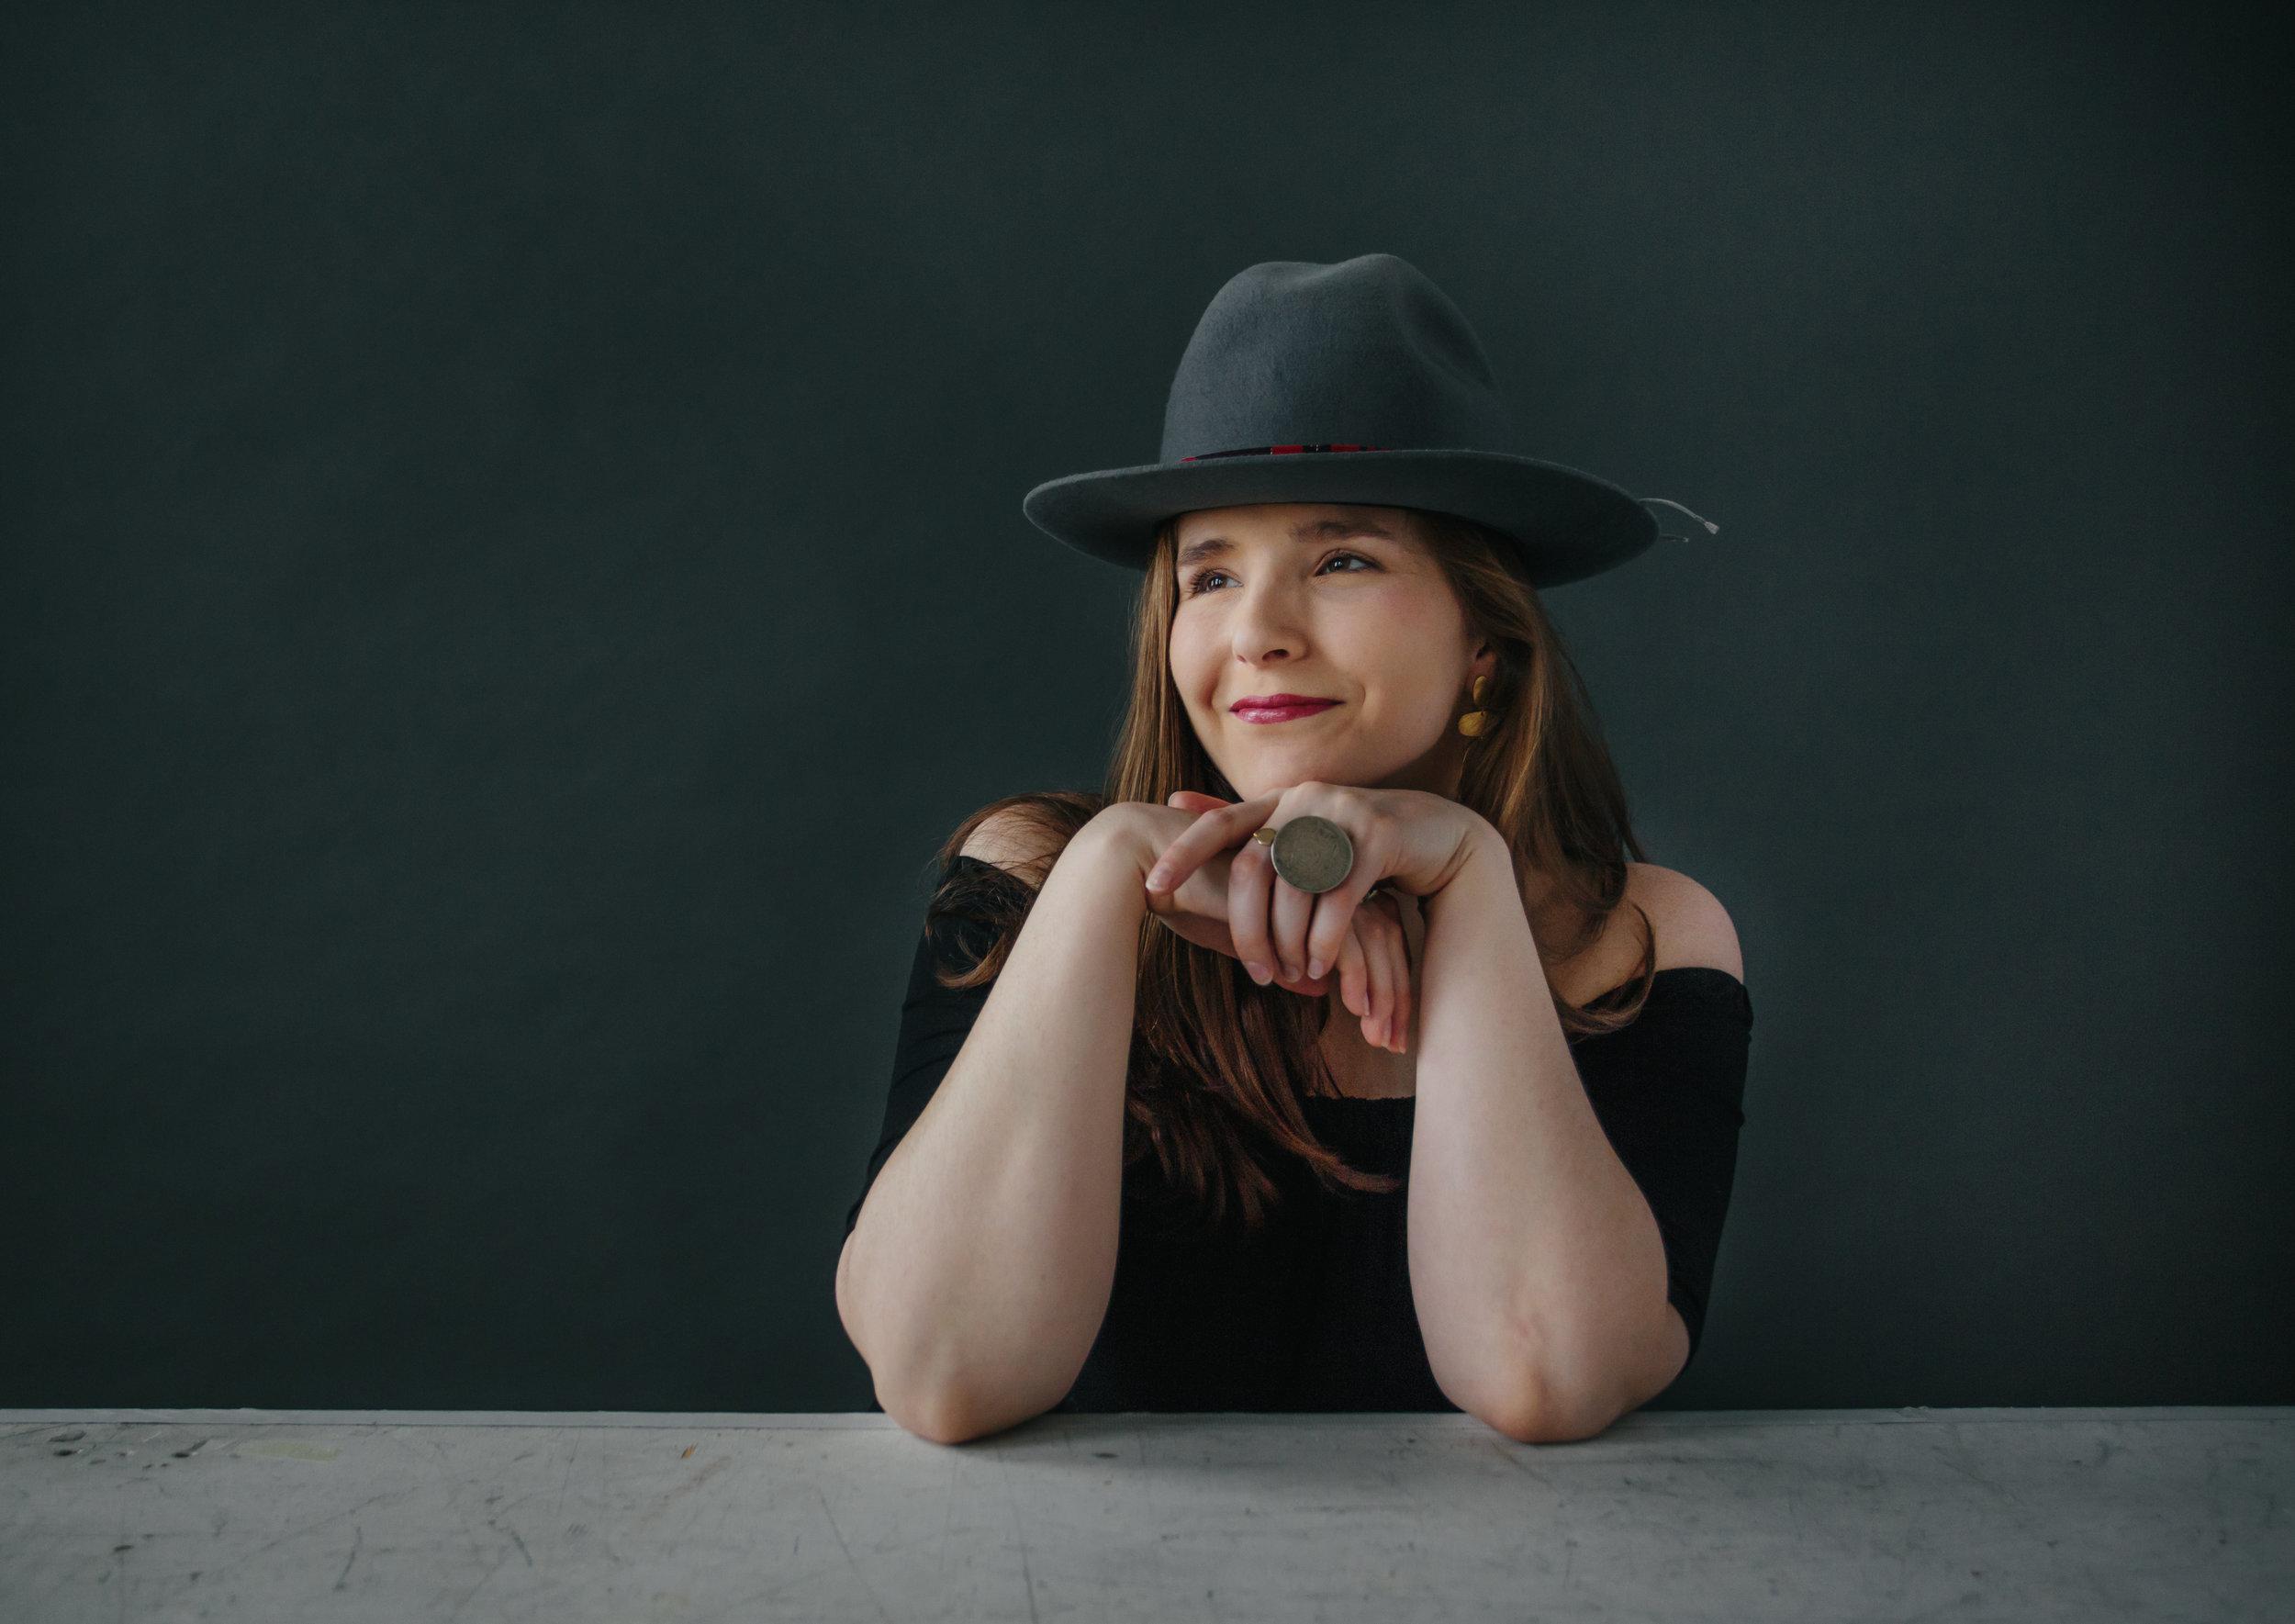 professional portrait photographer portland maine